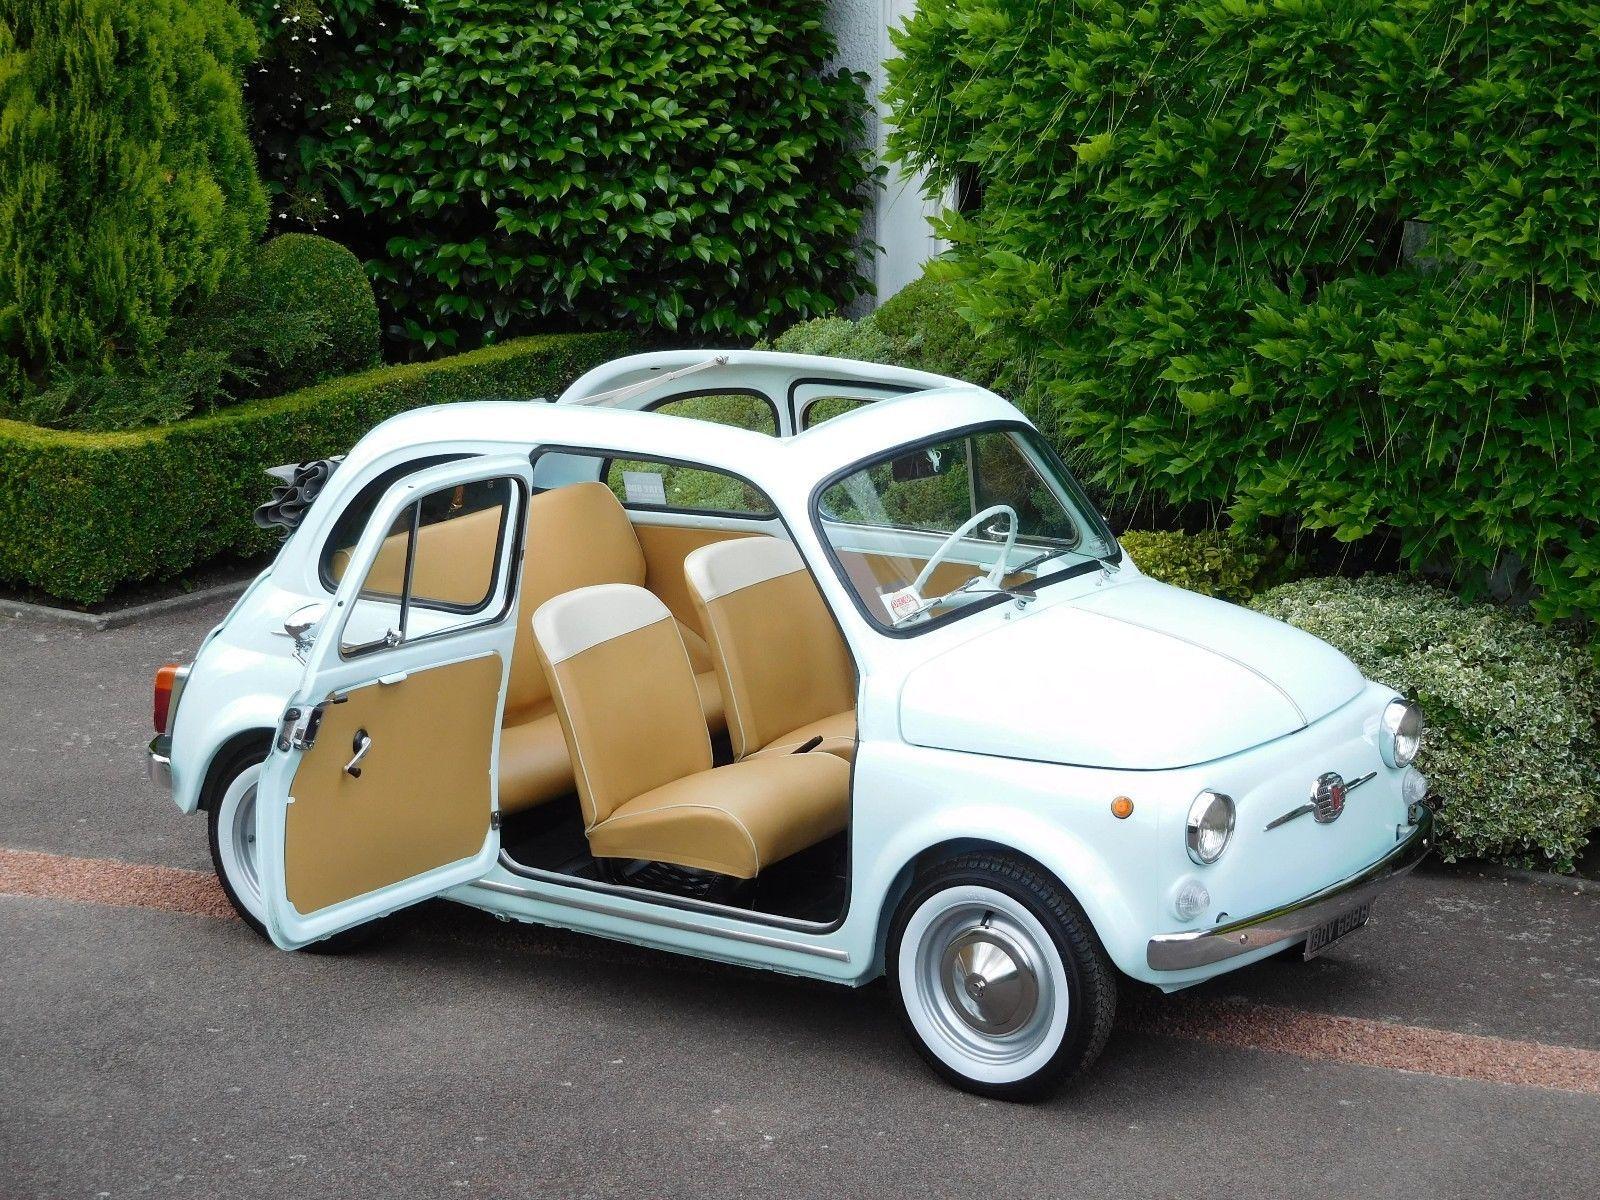 eBay: Fiat 500D Trasformabile Classic / 1962 / LHD - Fully Restored ...